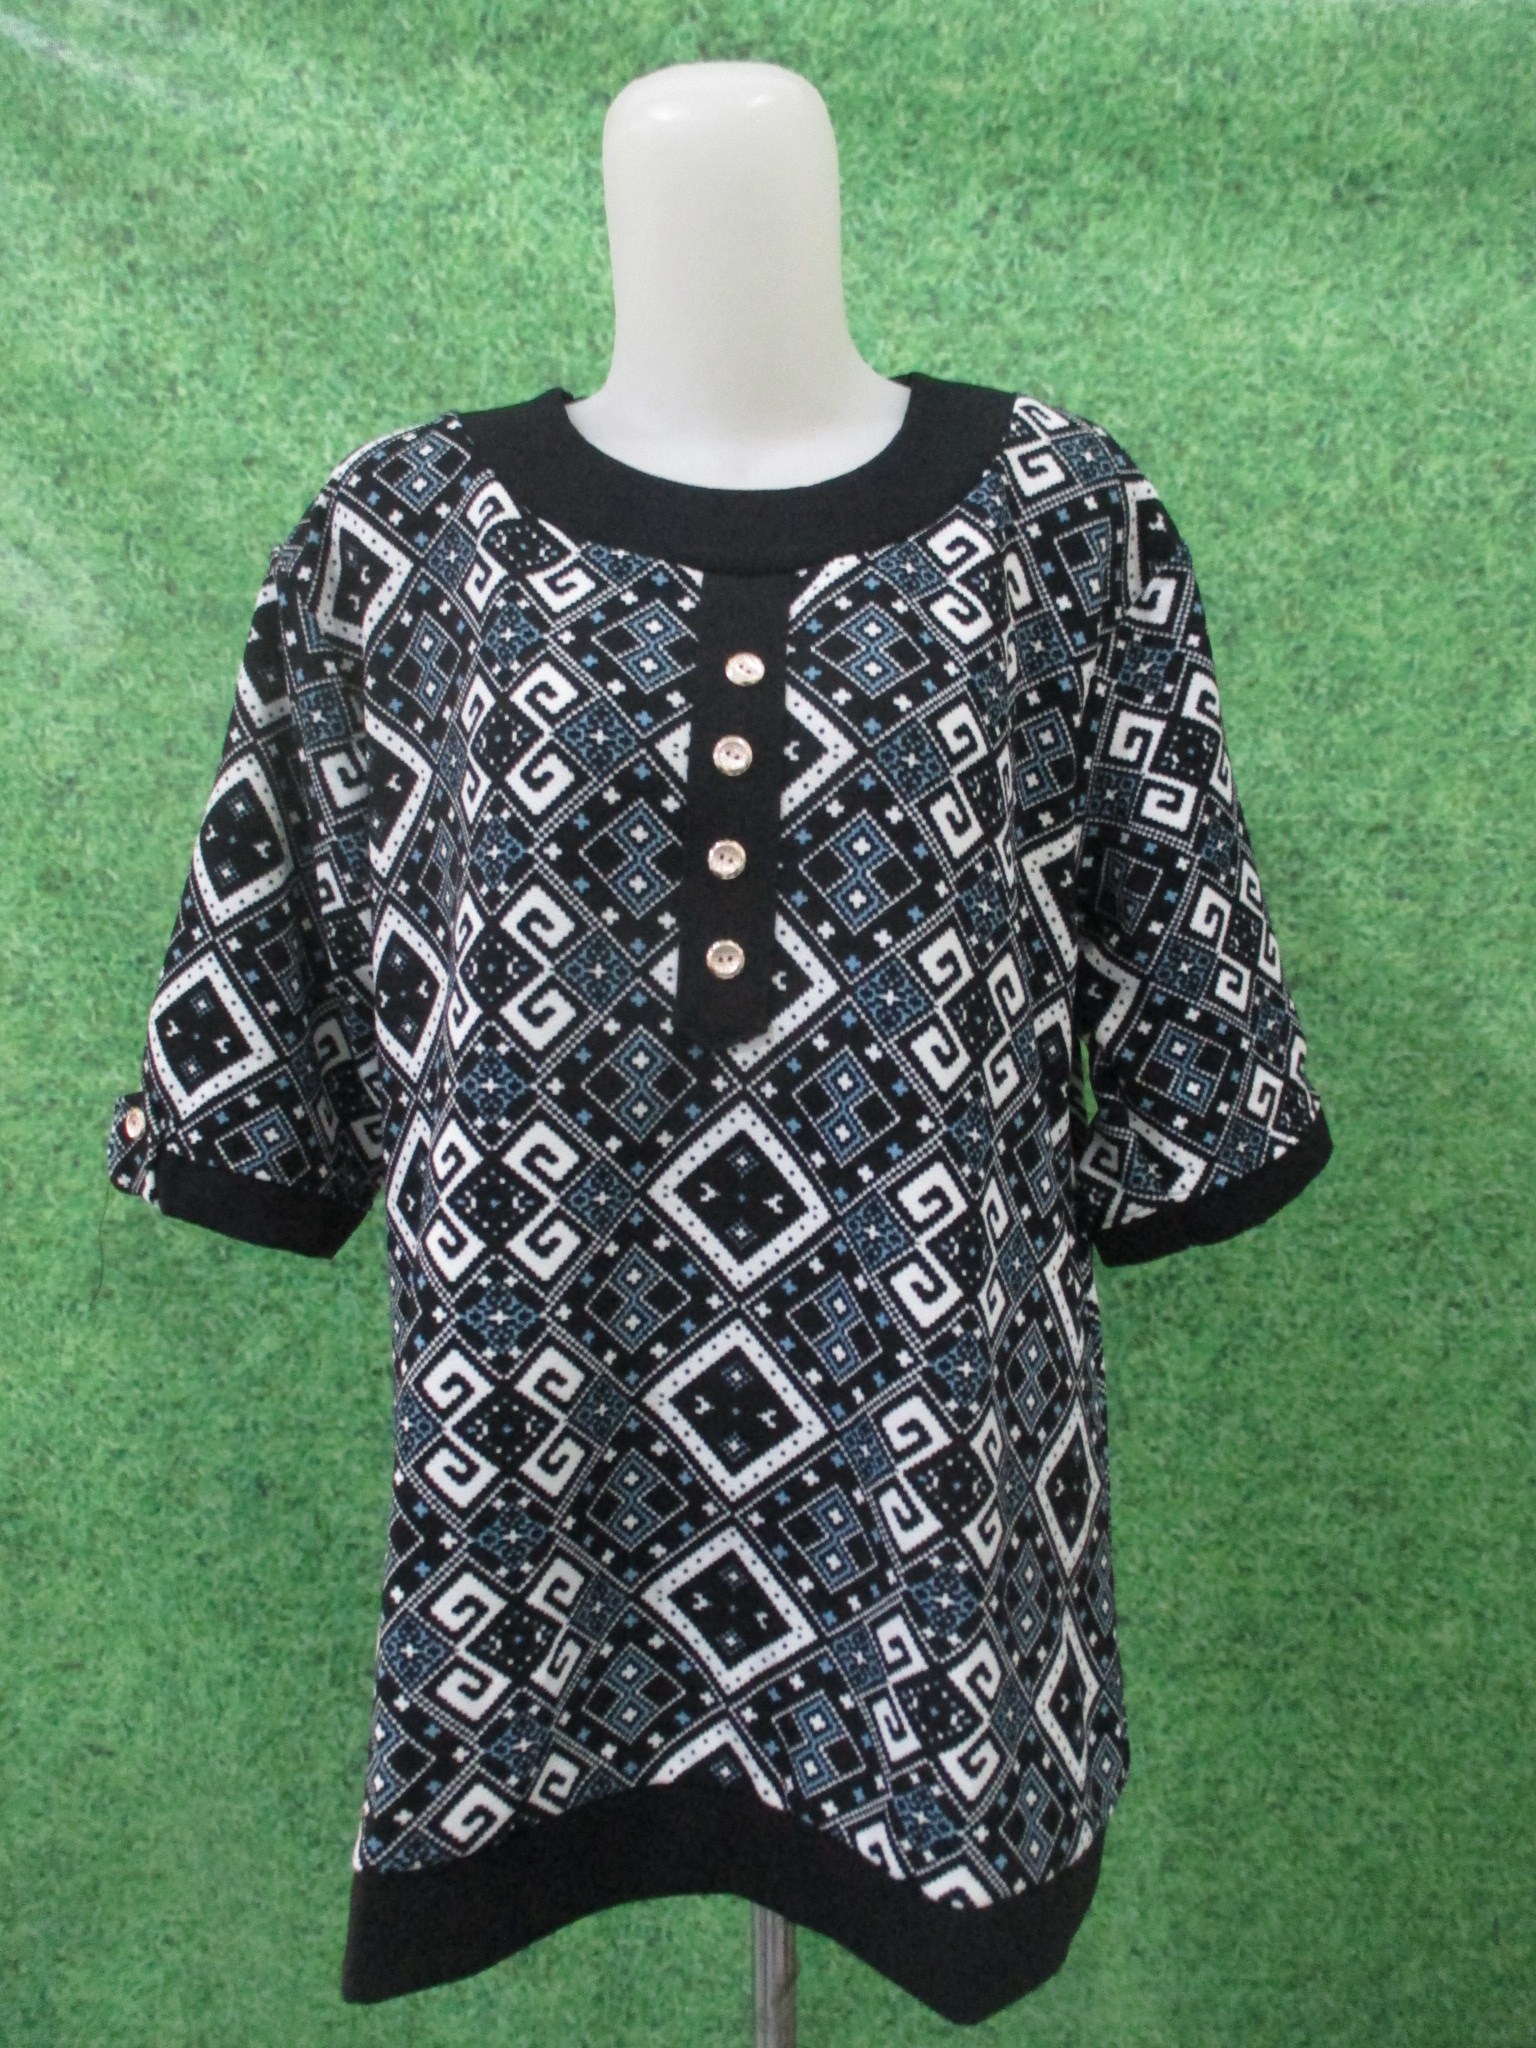 ObralanBaju.com Obral Baju Pakaian Murah Meriah 5000 Kaos Sabrina 7/8